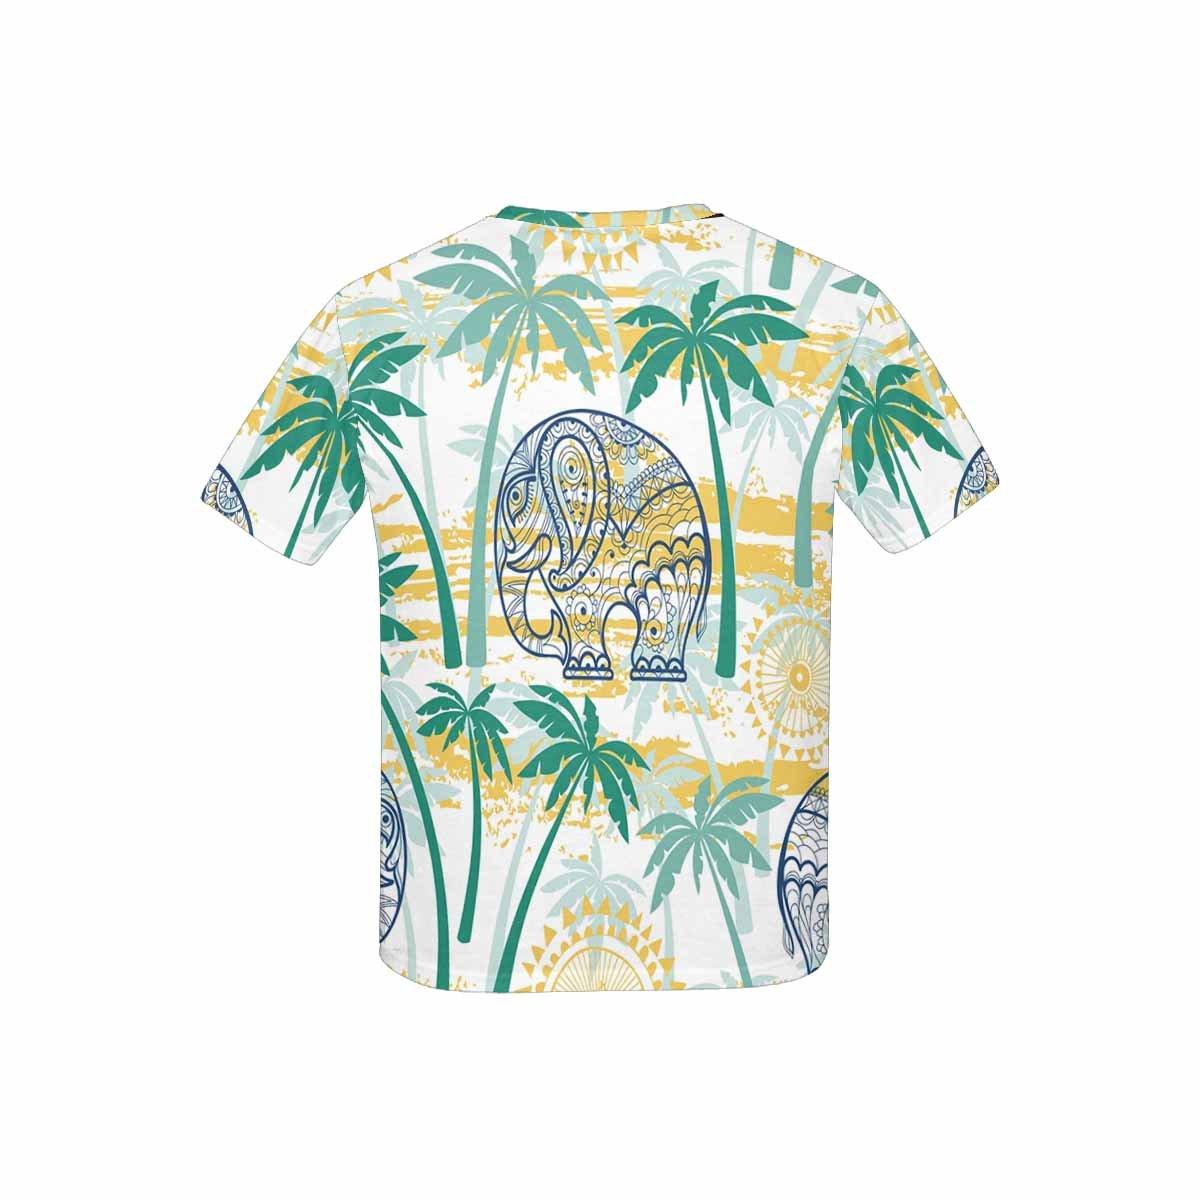 INTERESTPRINT Childs T-Shirt Elephants and Palms XS-XL